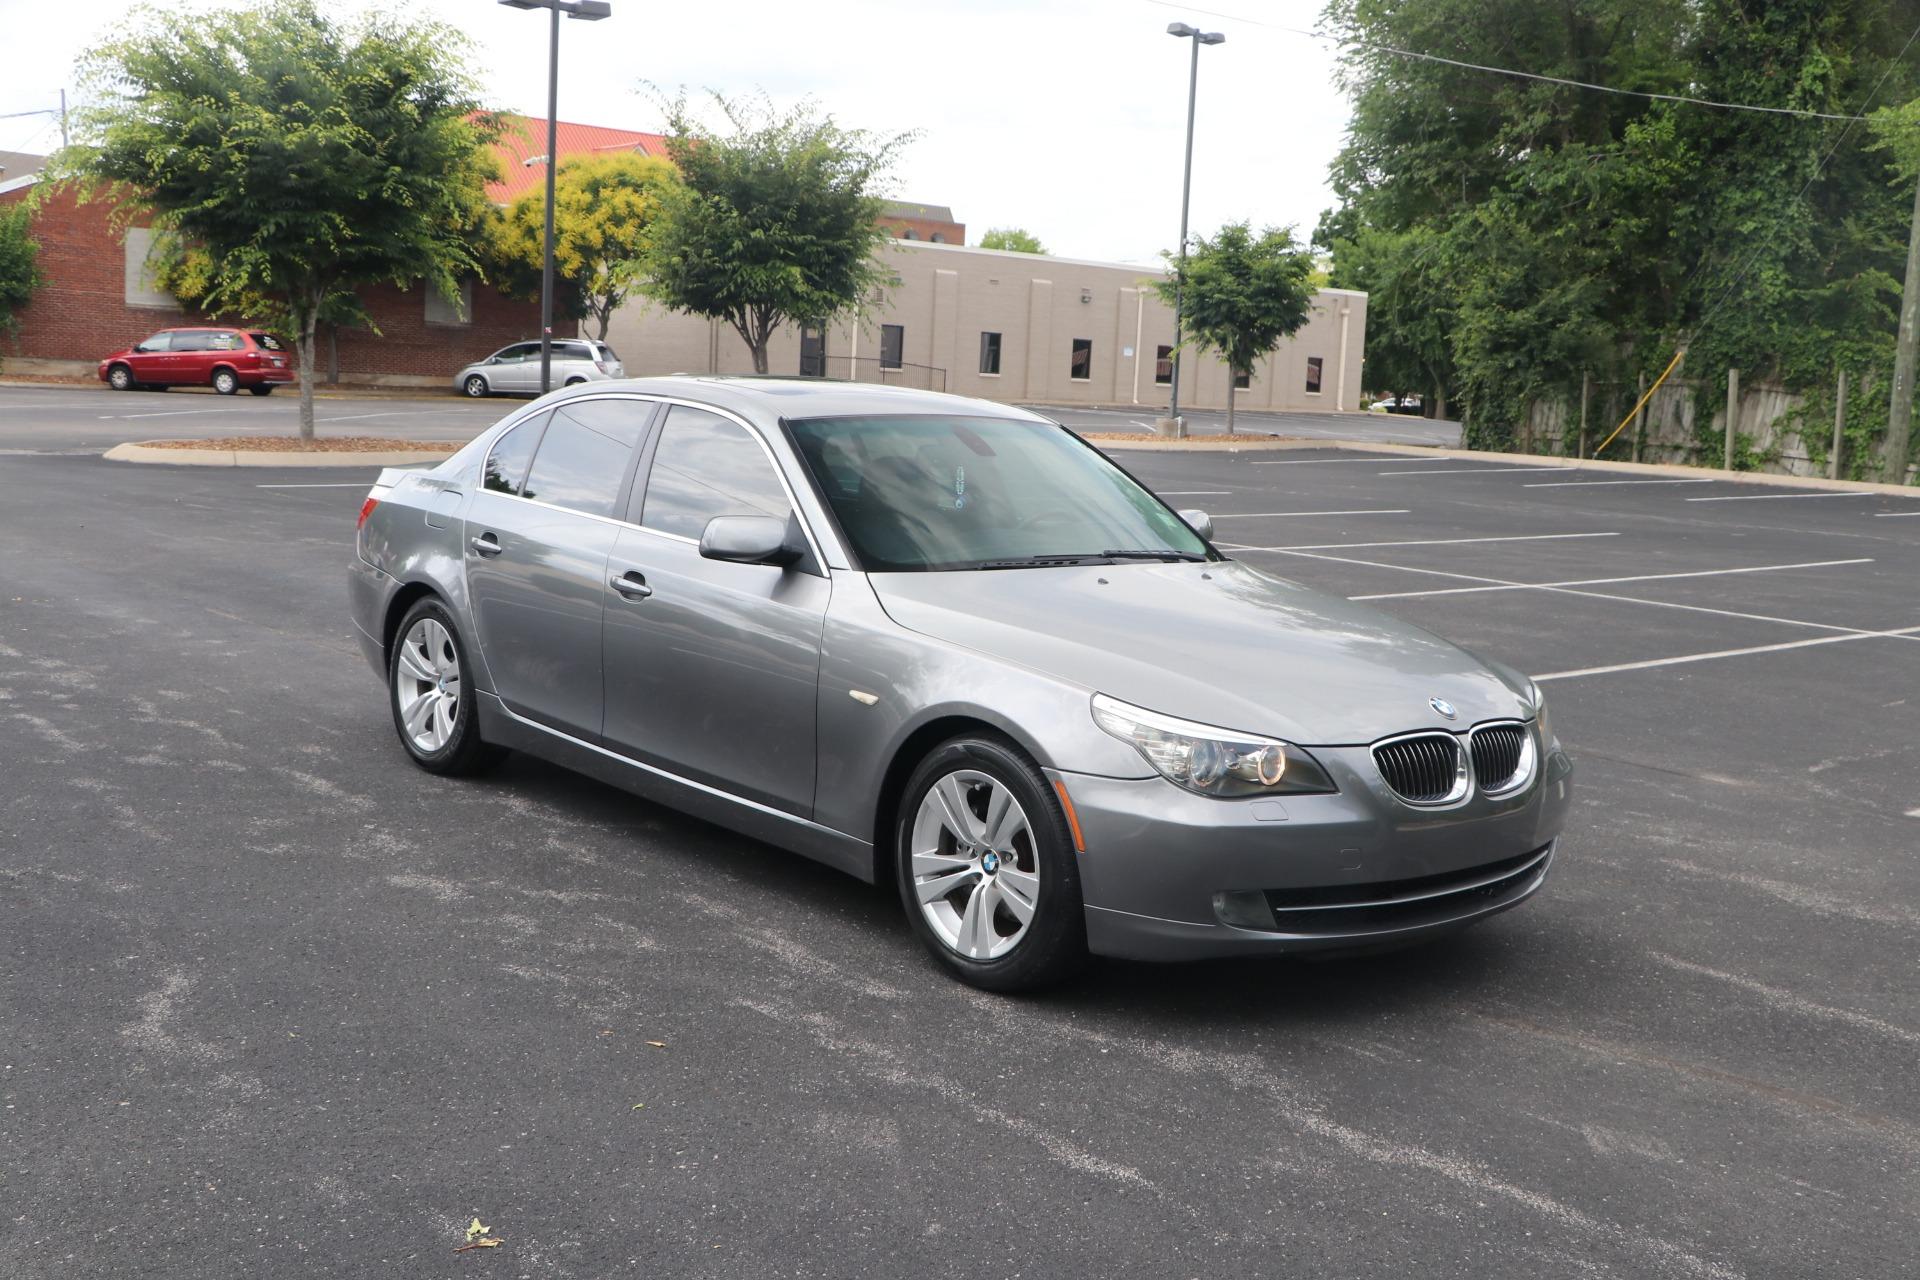 Used 2009 BMW 528i PREMIUM RWD W/SUNROOF for sale $8,650 at Auto Collection in Murfreesboro TN 37130 1